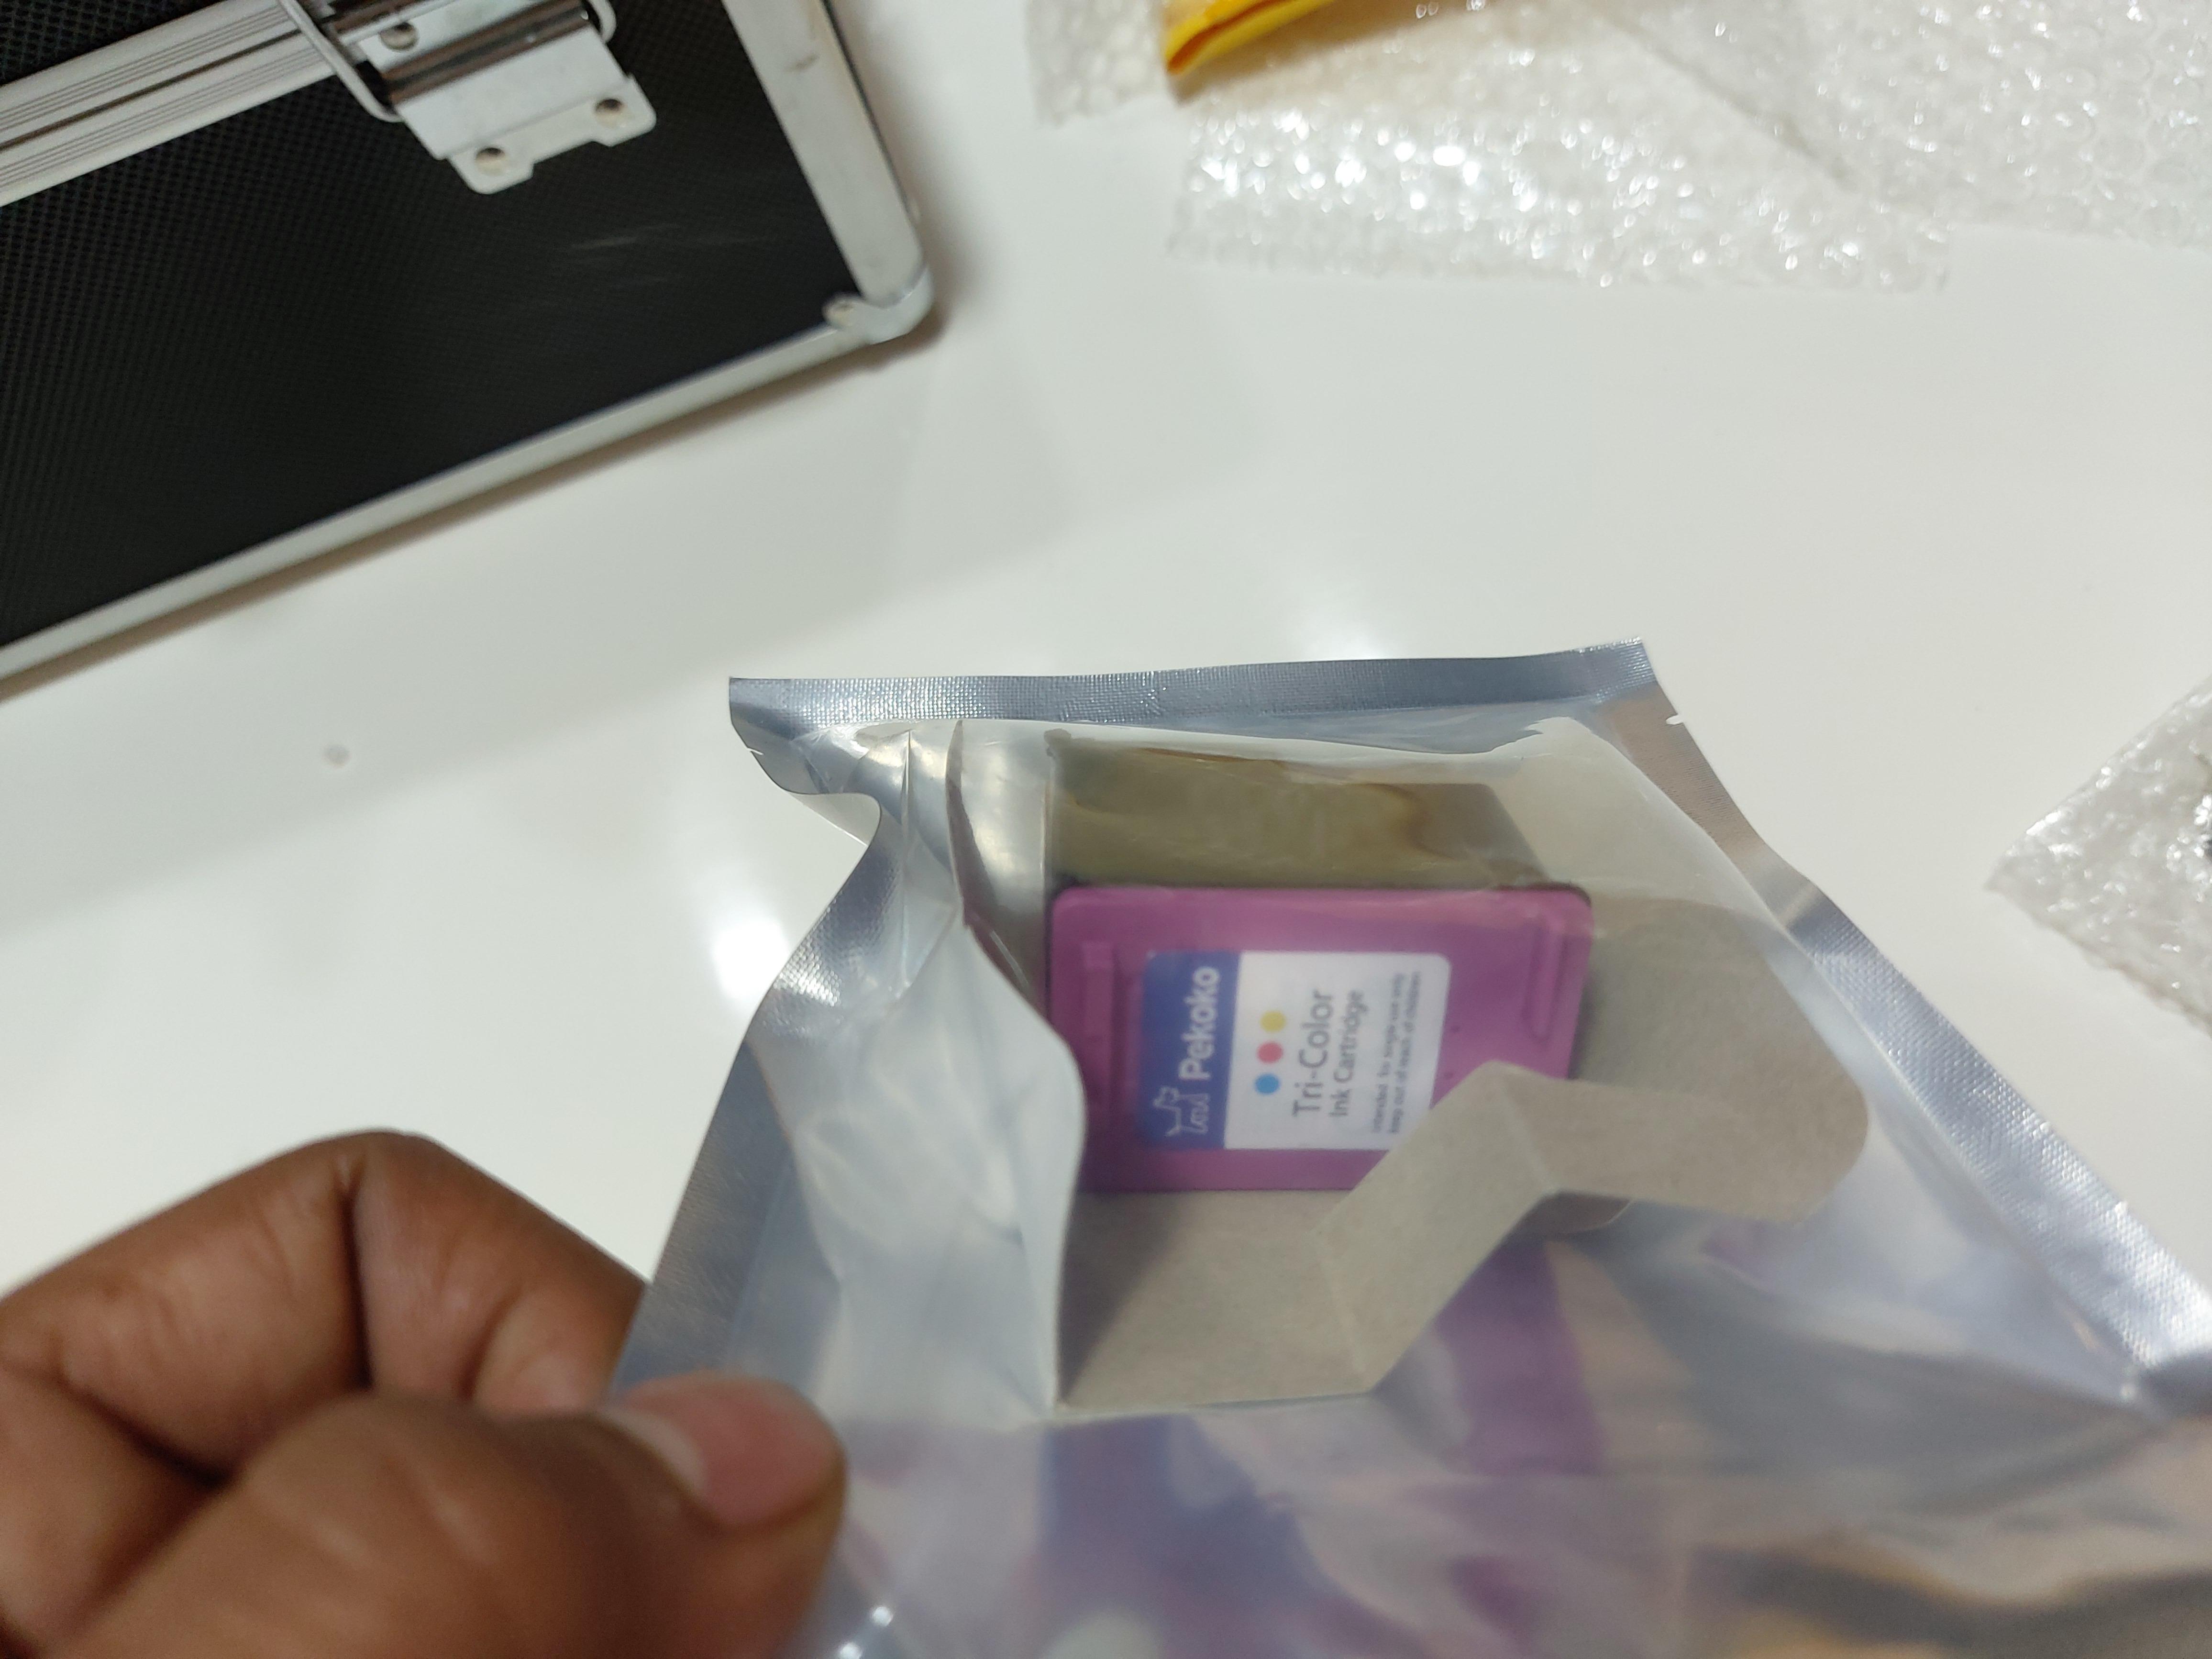 PEKOKO Hand Multi color Printer